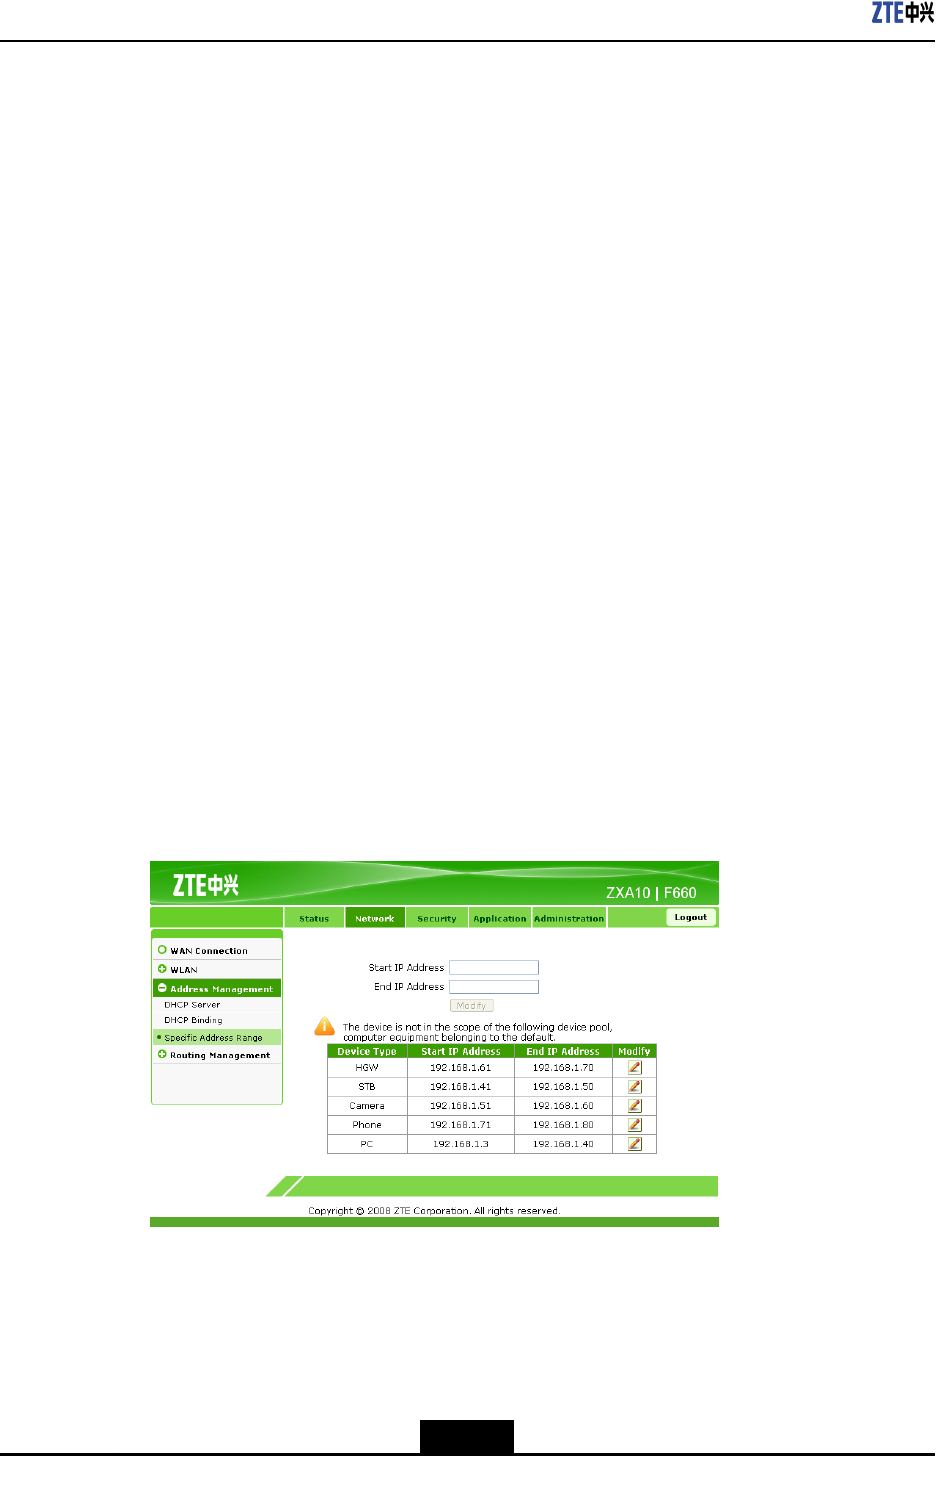 ZTE ZXHNF660 GPON ONT User Manual